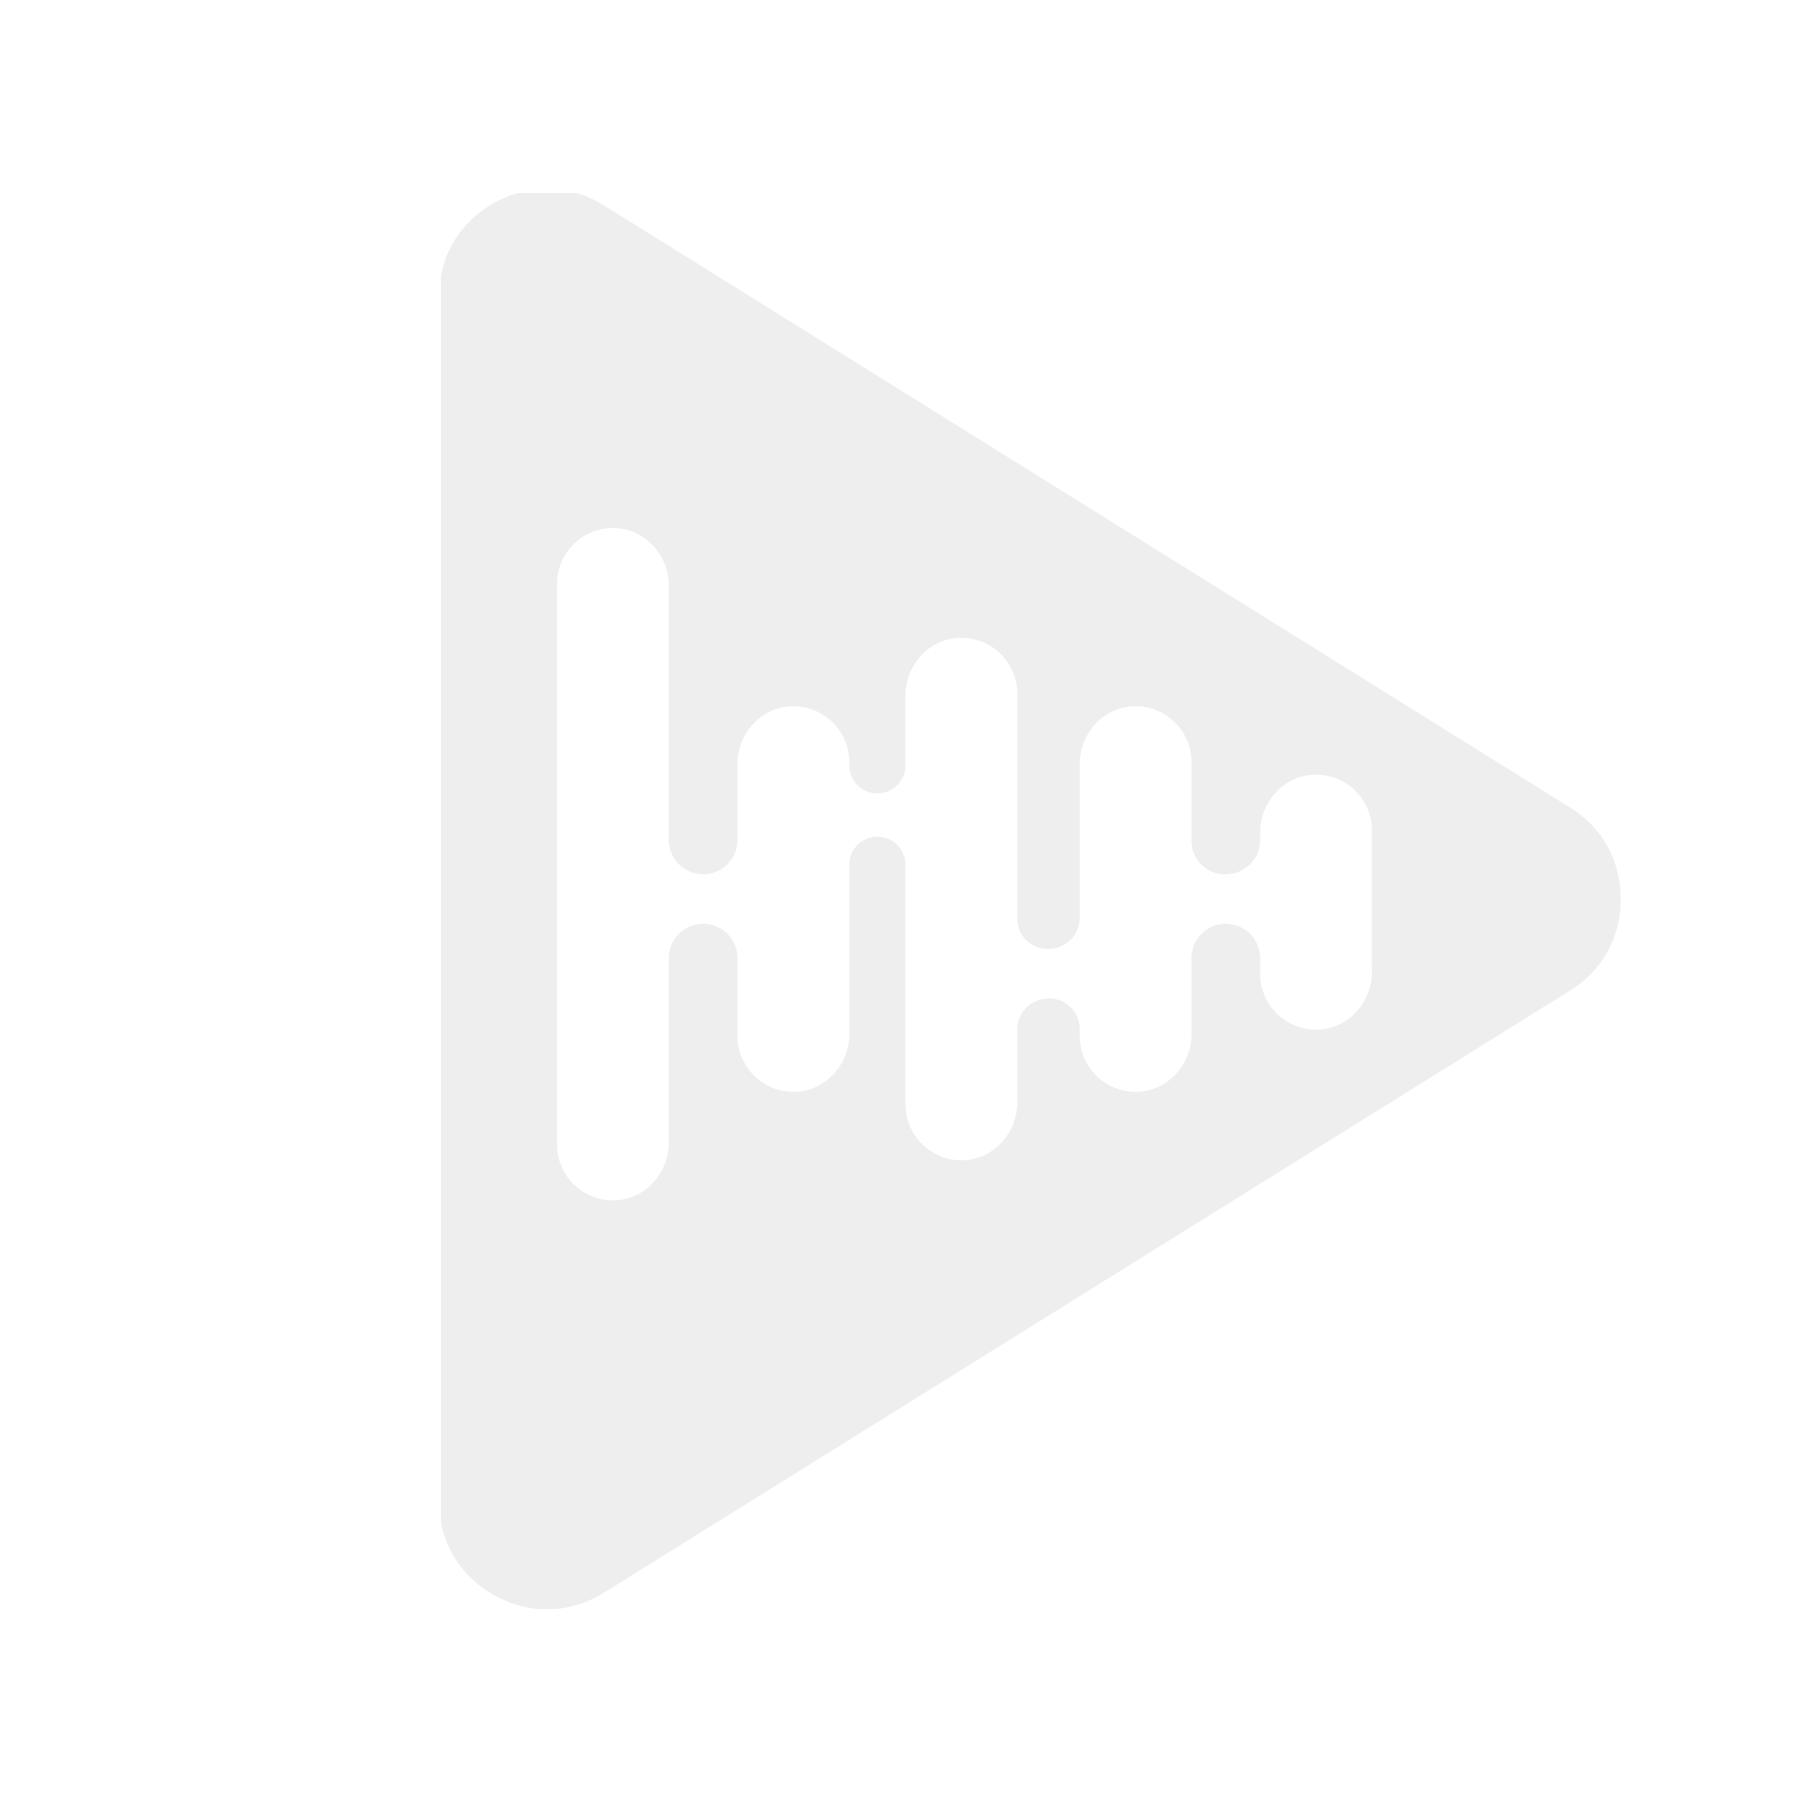 Kufatec Fistune 39703